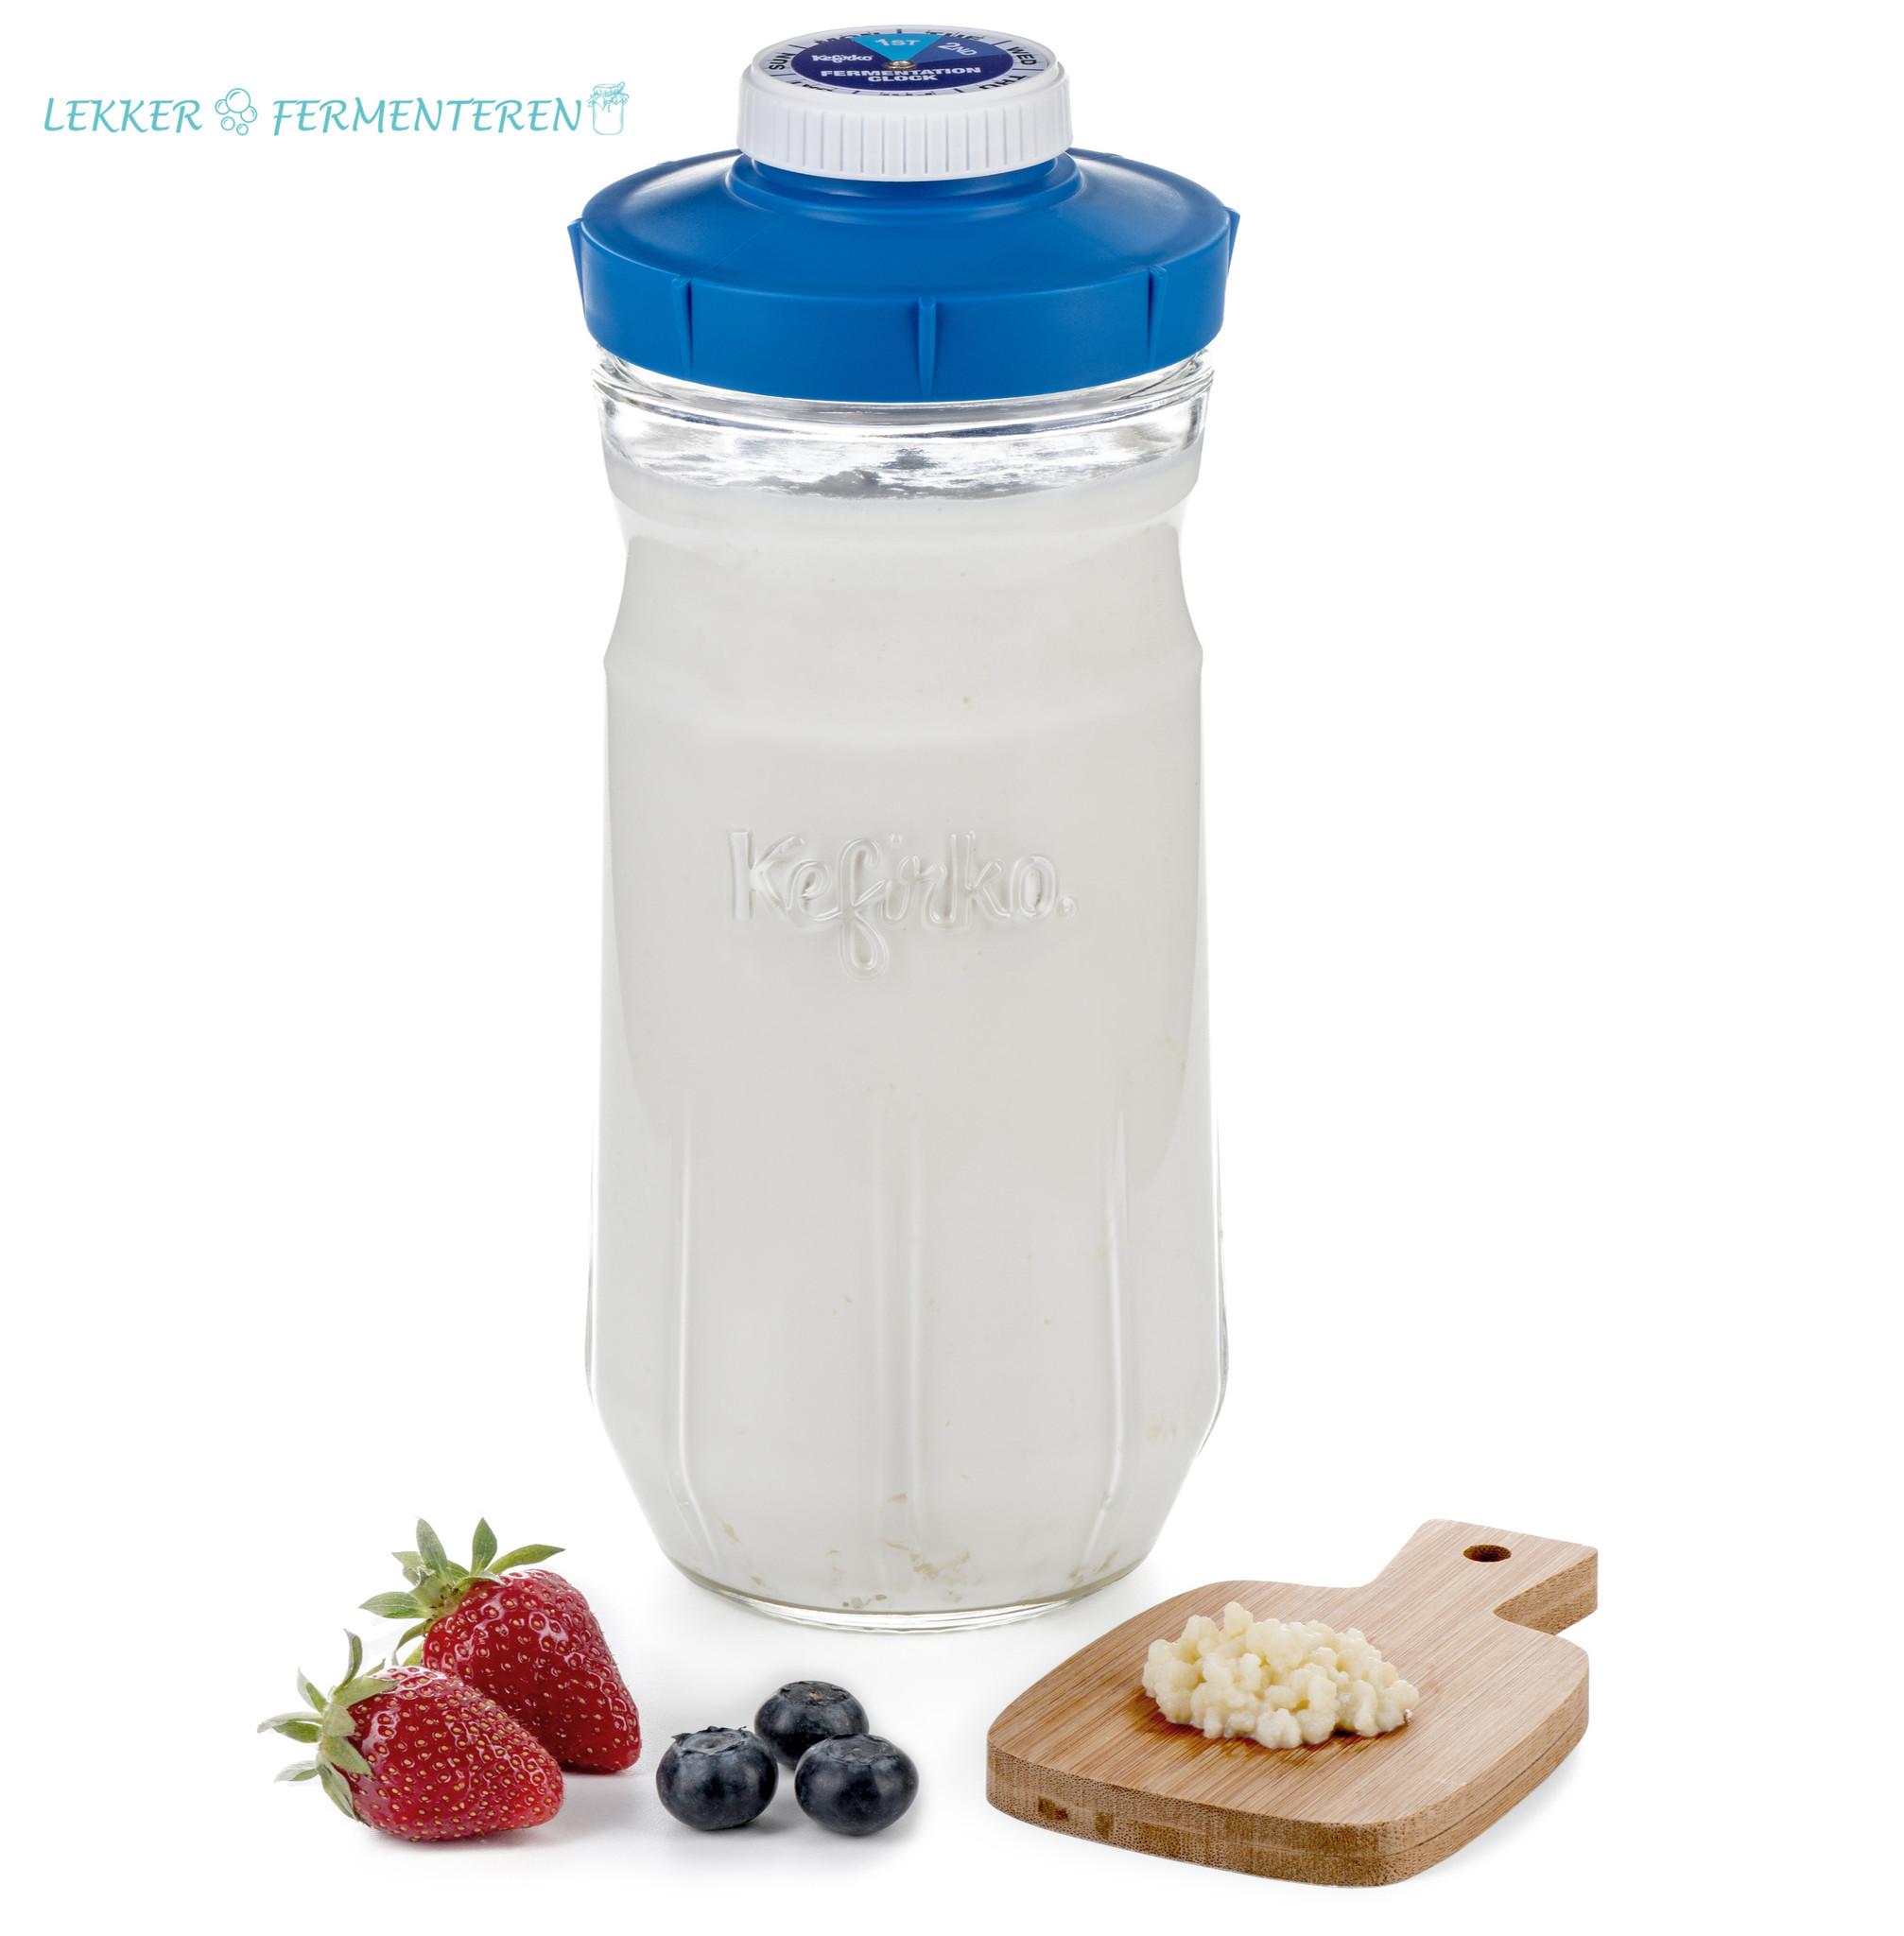 Kefirko glas voor tweede fermentatie 1400 ml.